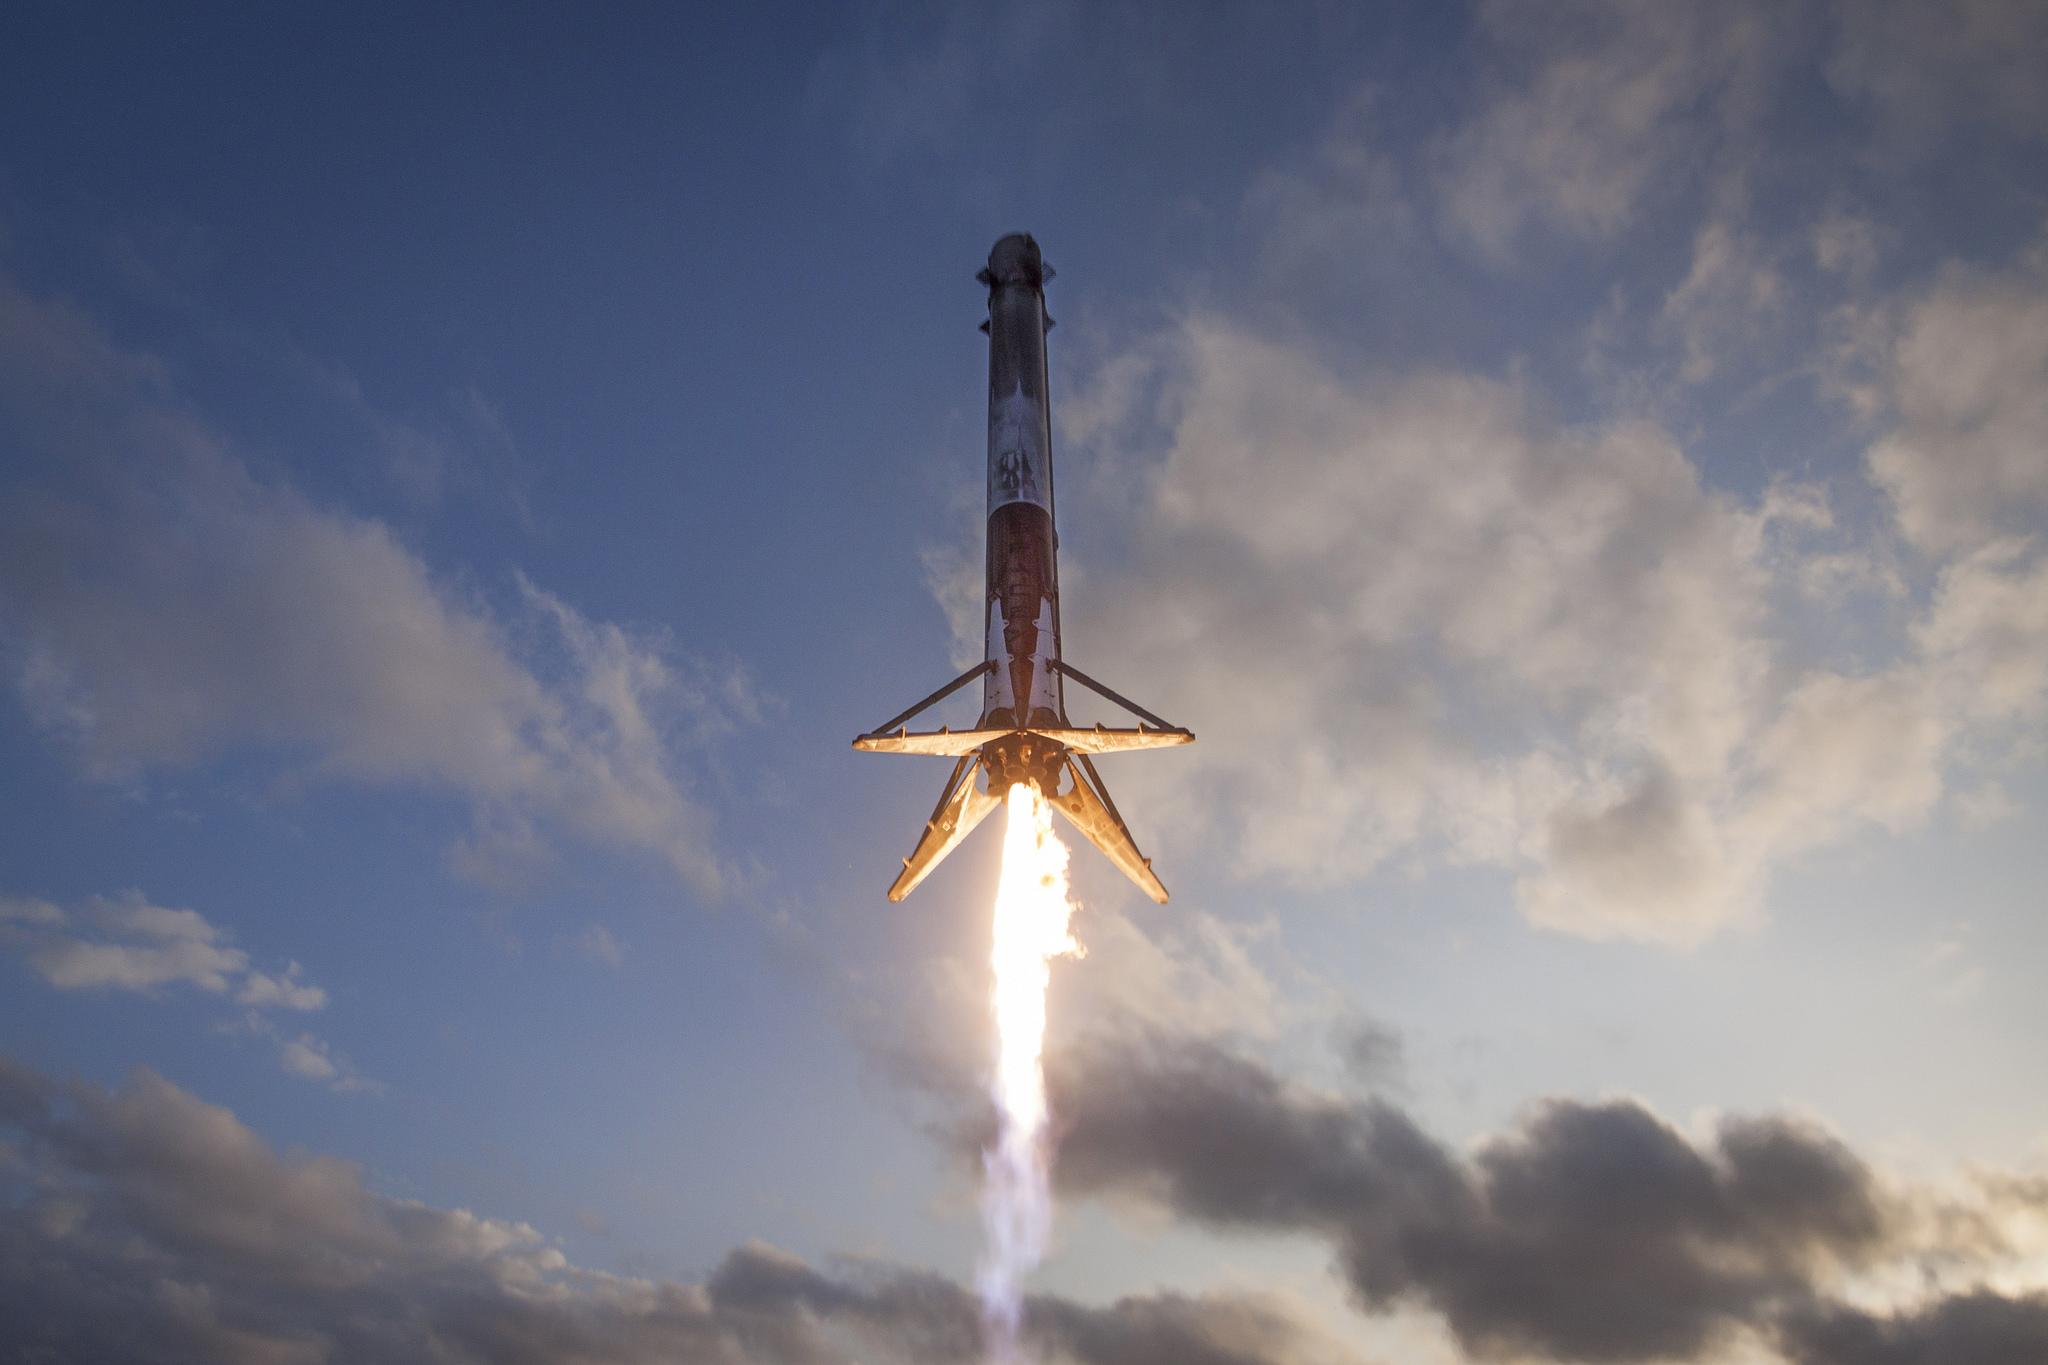 SpaceX's reused rockets